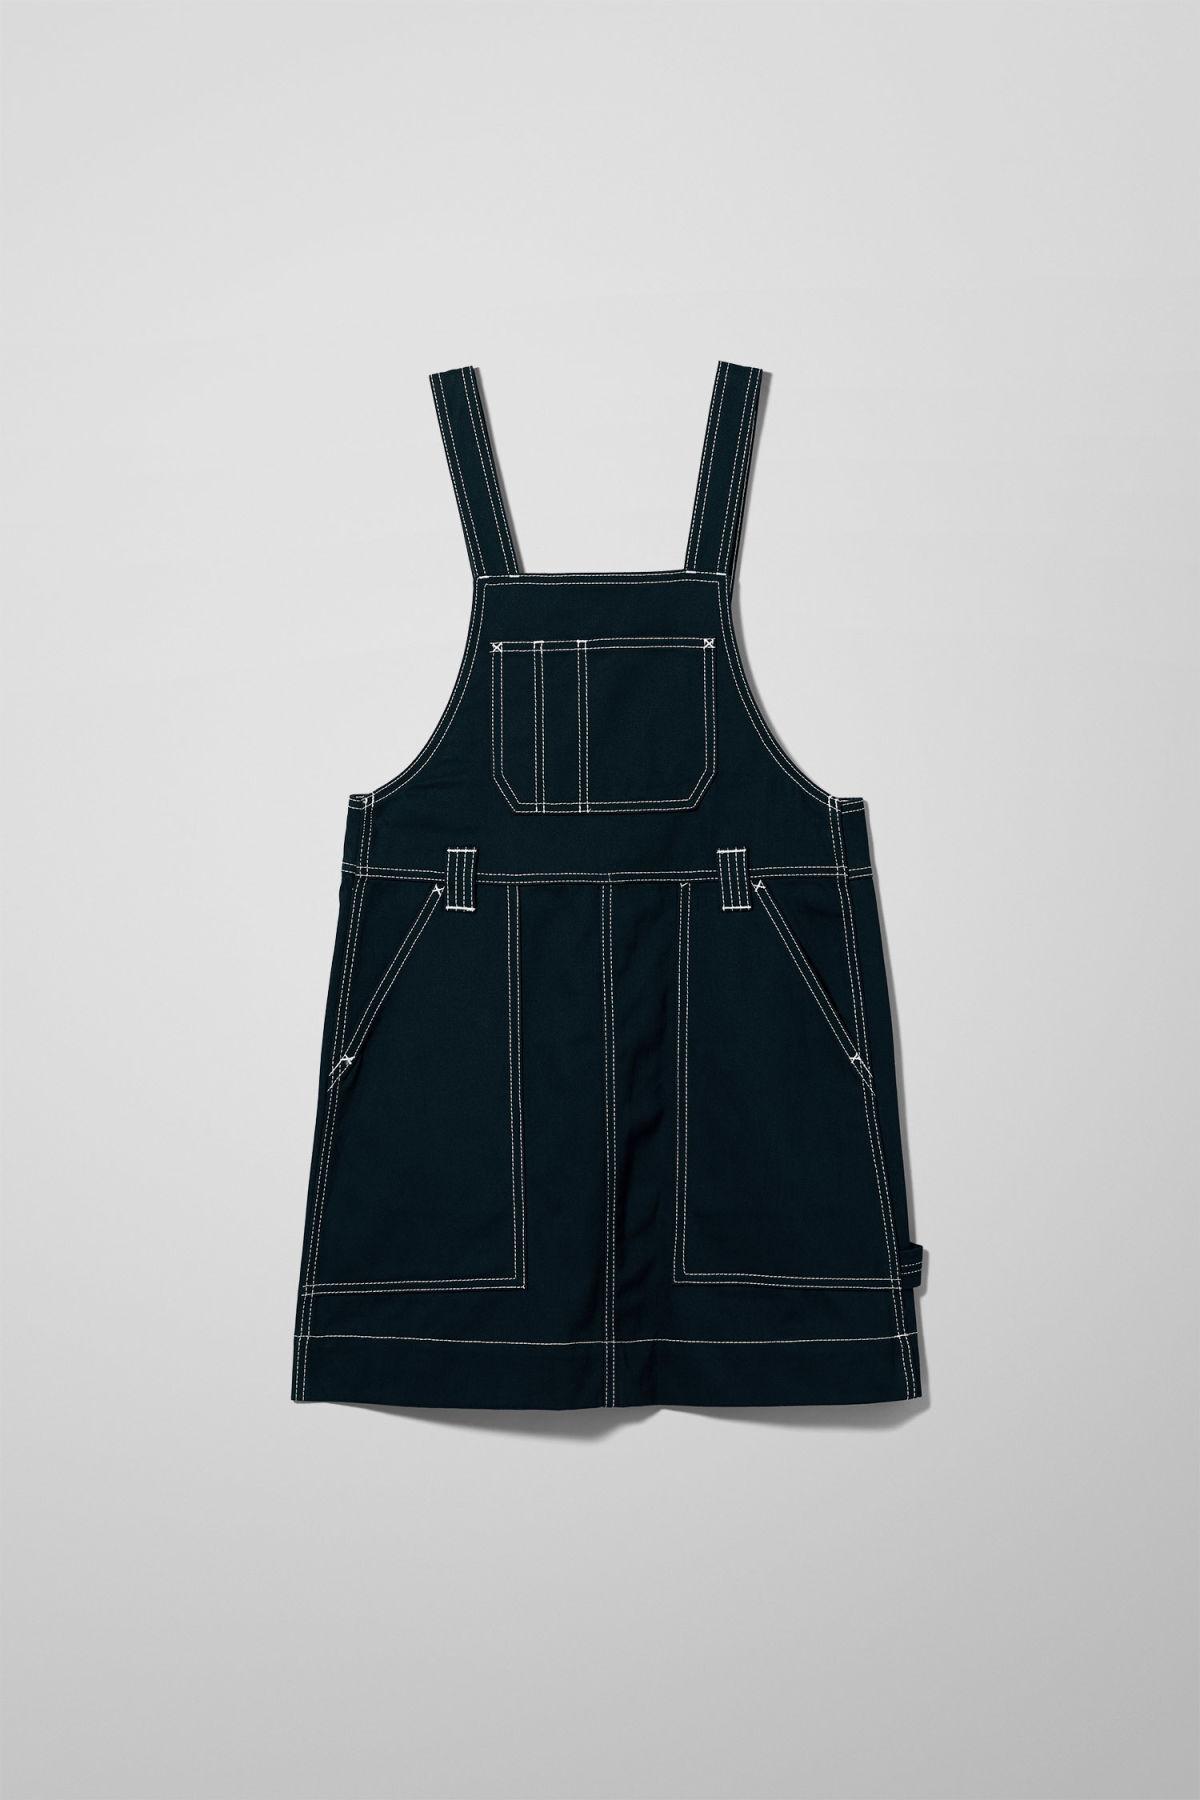 Image of Grow Workwear Dress - Black-38